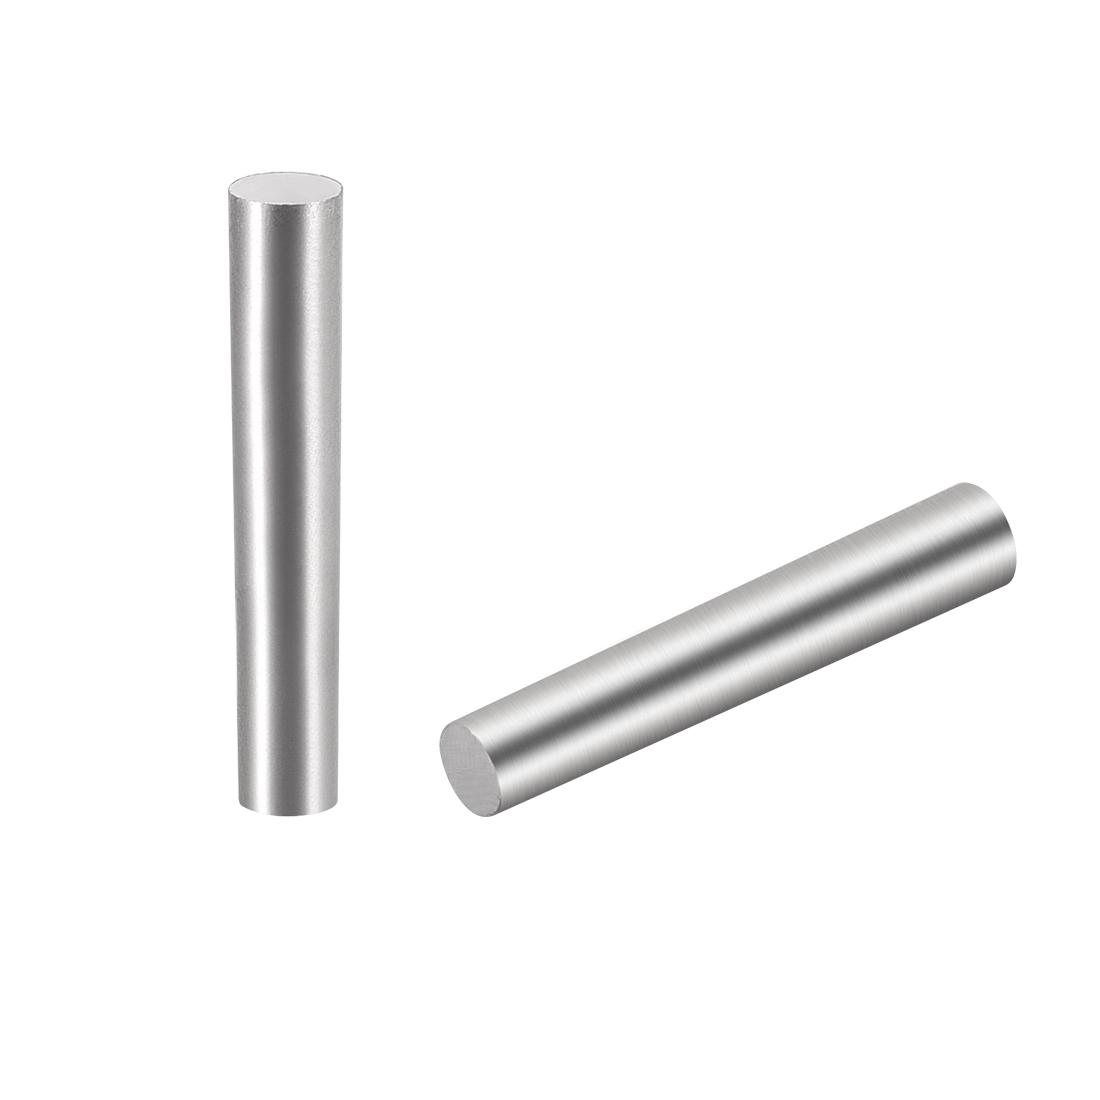 2Pcs 4mm x 25mm 1:50 Taper Pin 304 Stainless Steel Shelf Support Pin Fasten